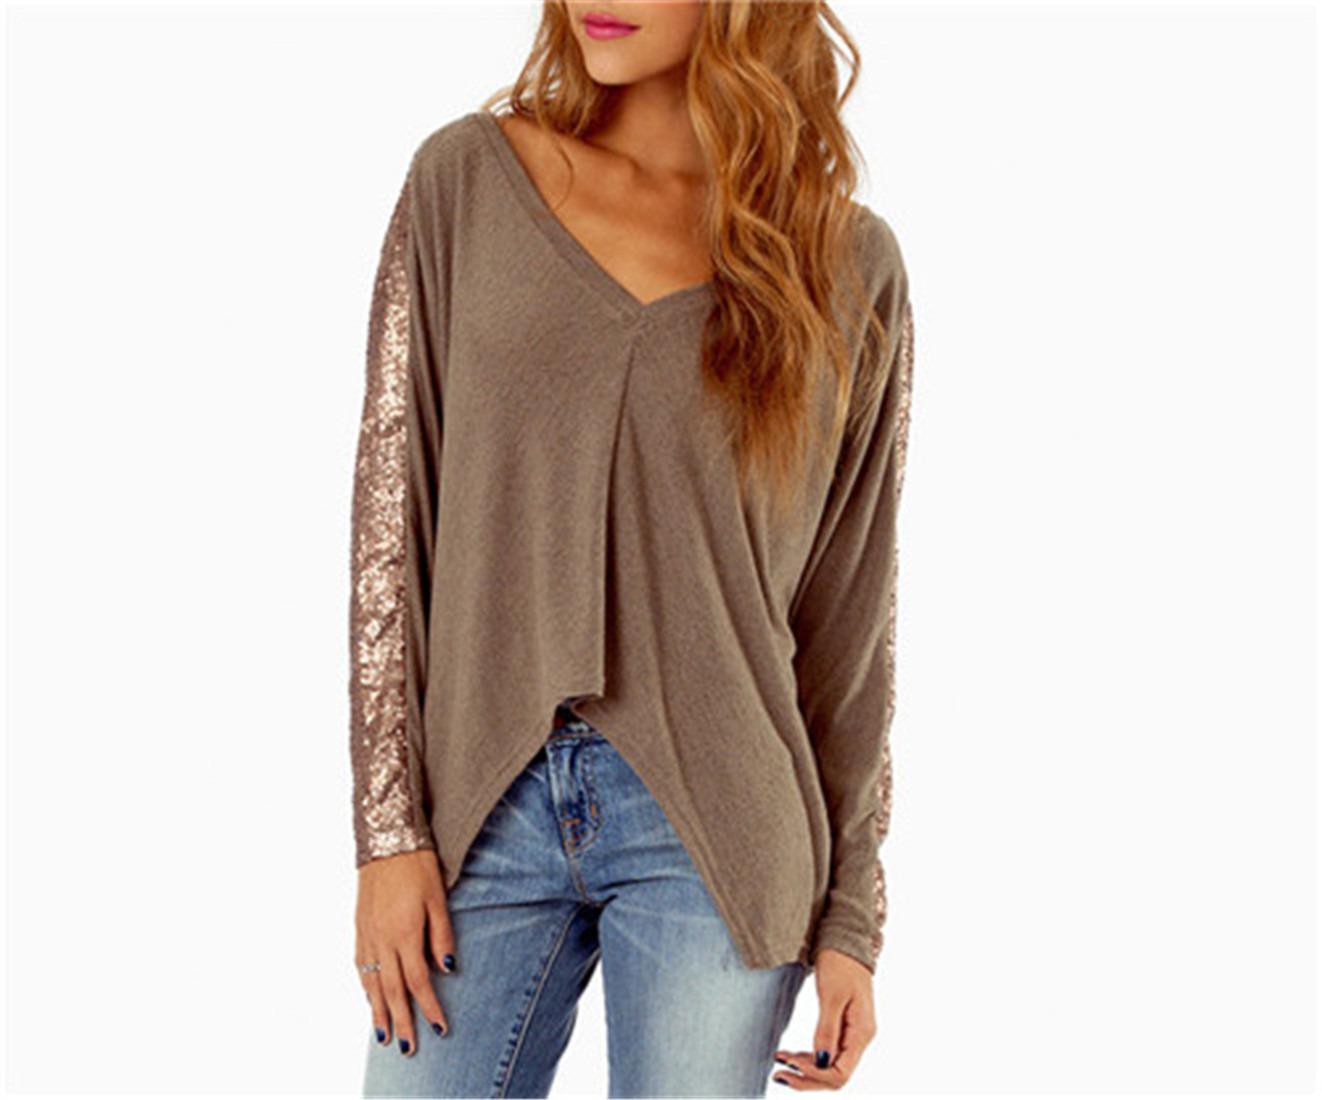 New Hot Bling Sequins Paillette Long Sleeve V Neck Women T-Shirt Tops Tee